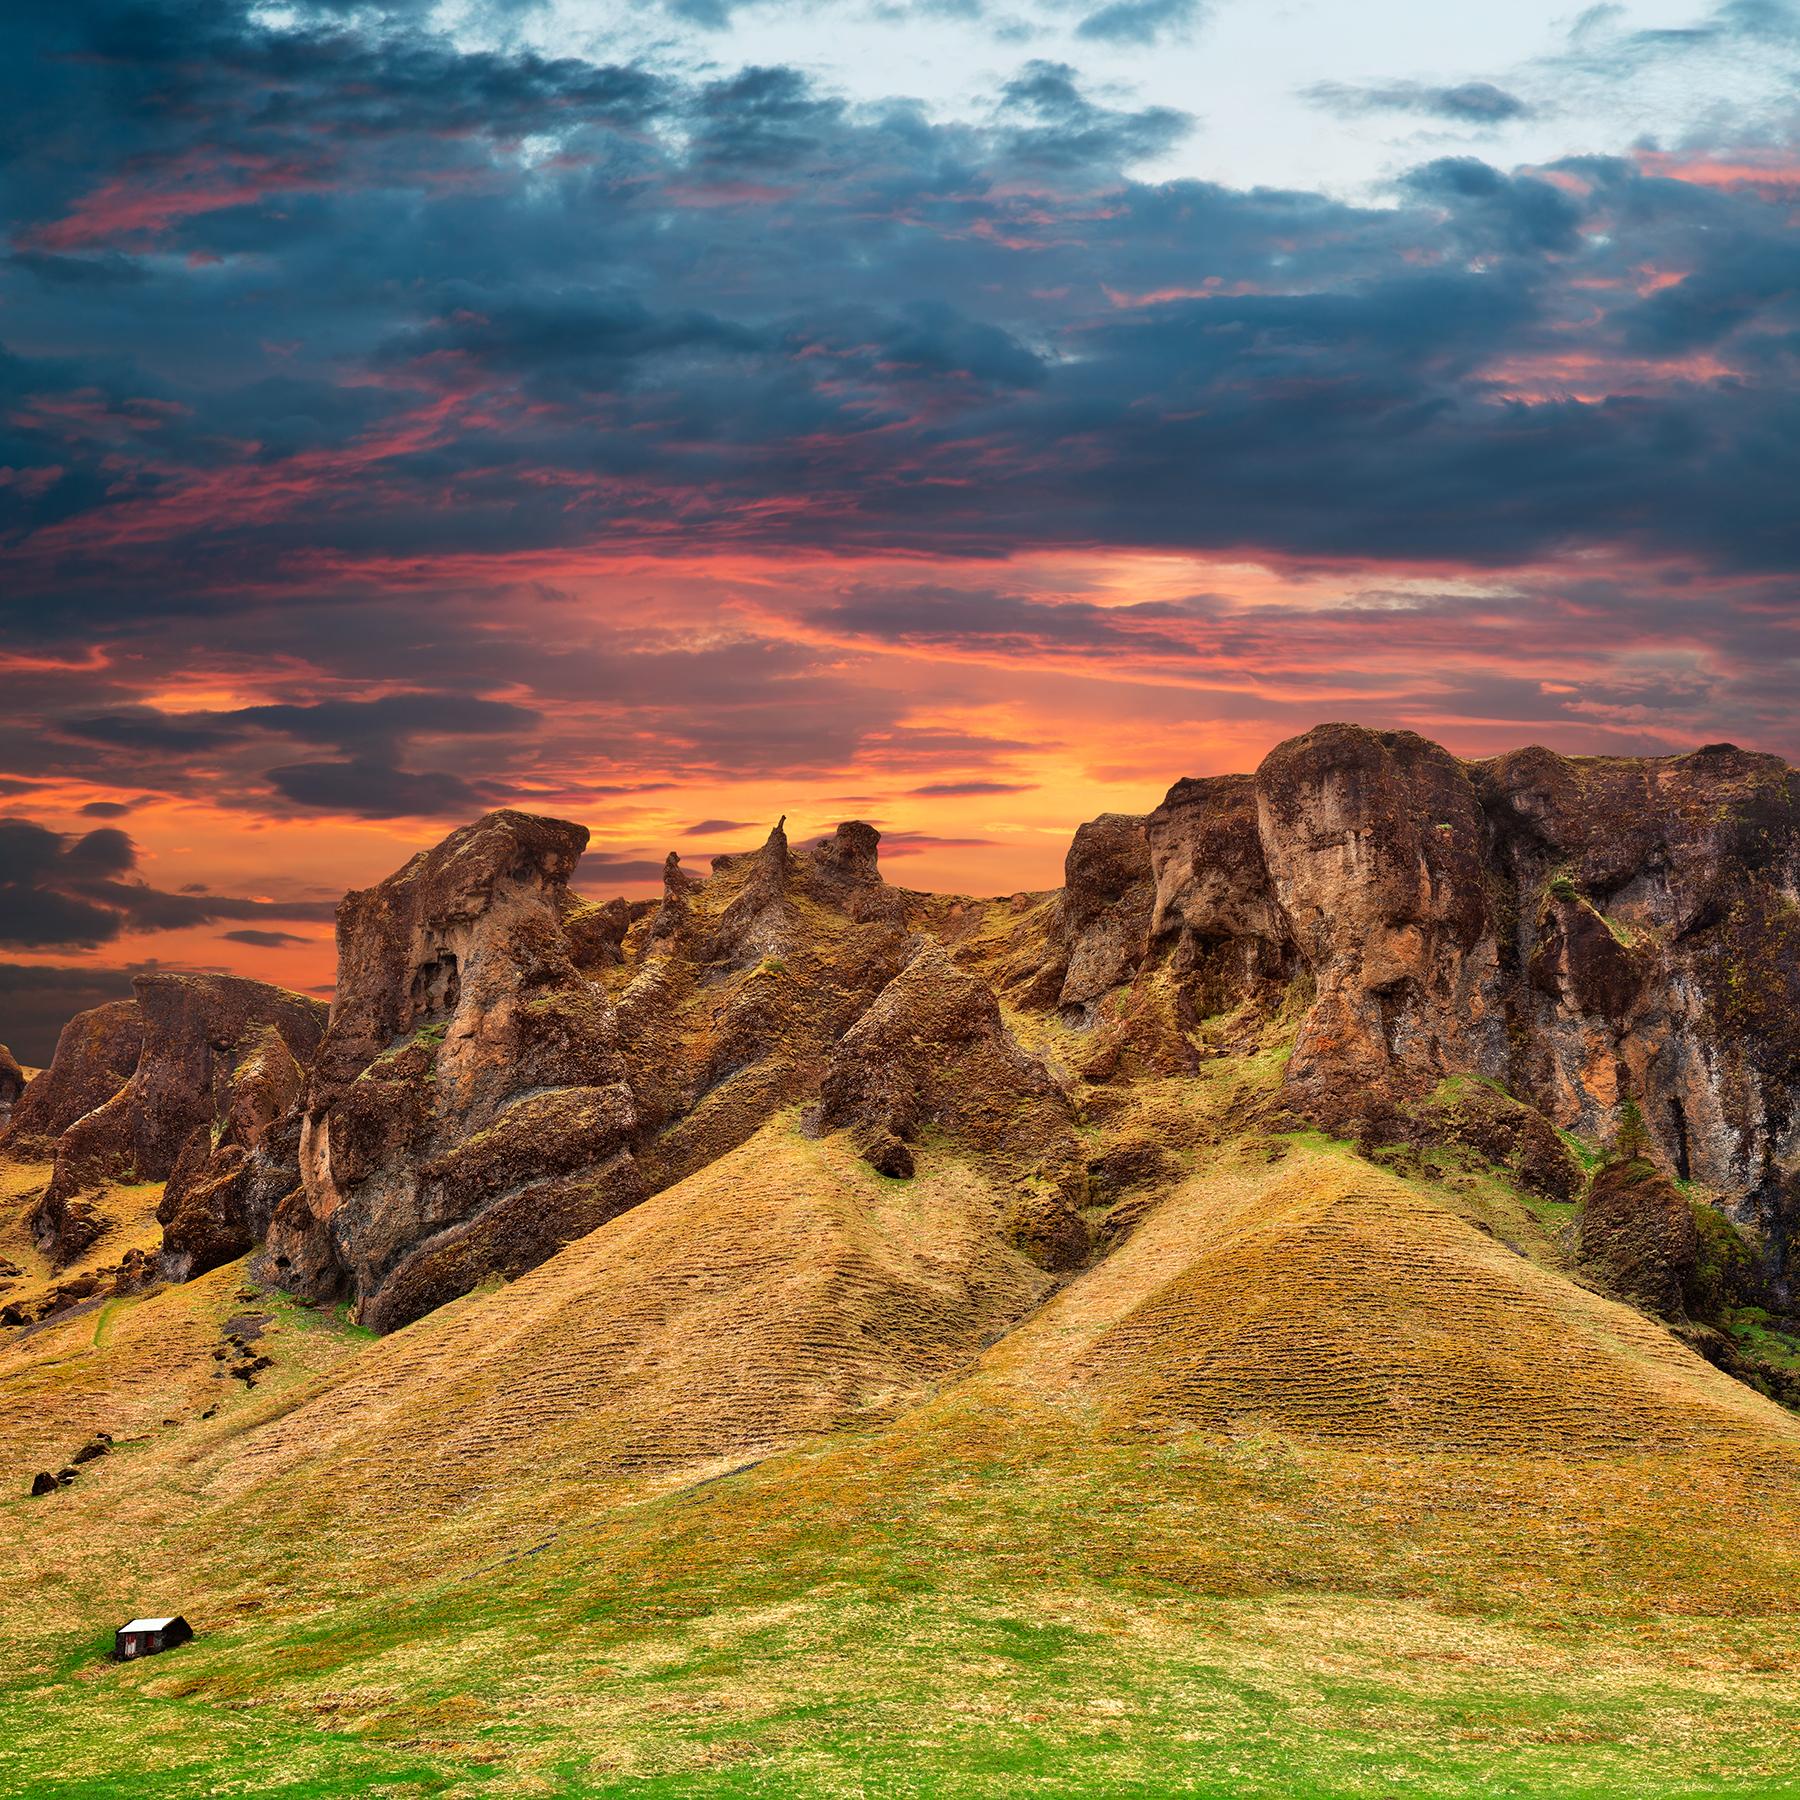 Iceland sunset fantasy - monster mountain photo